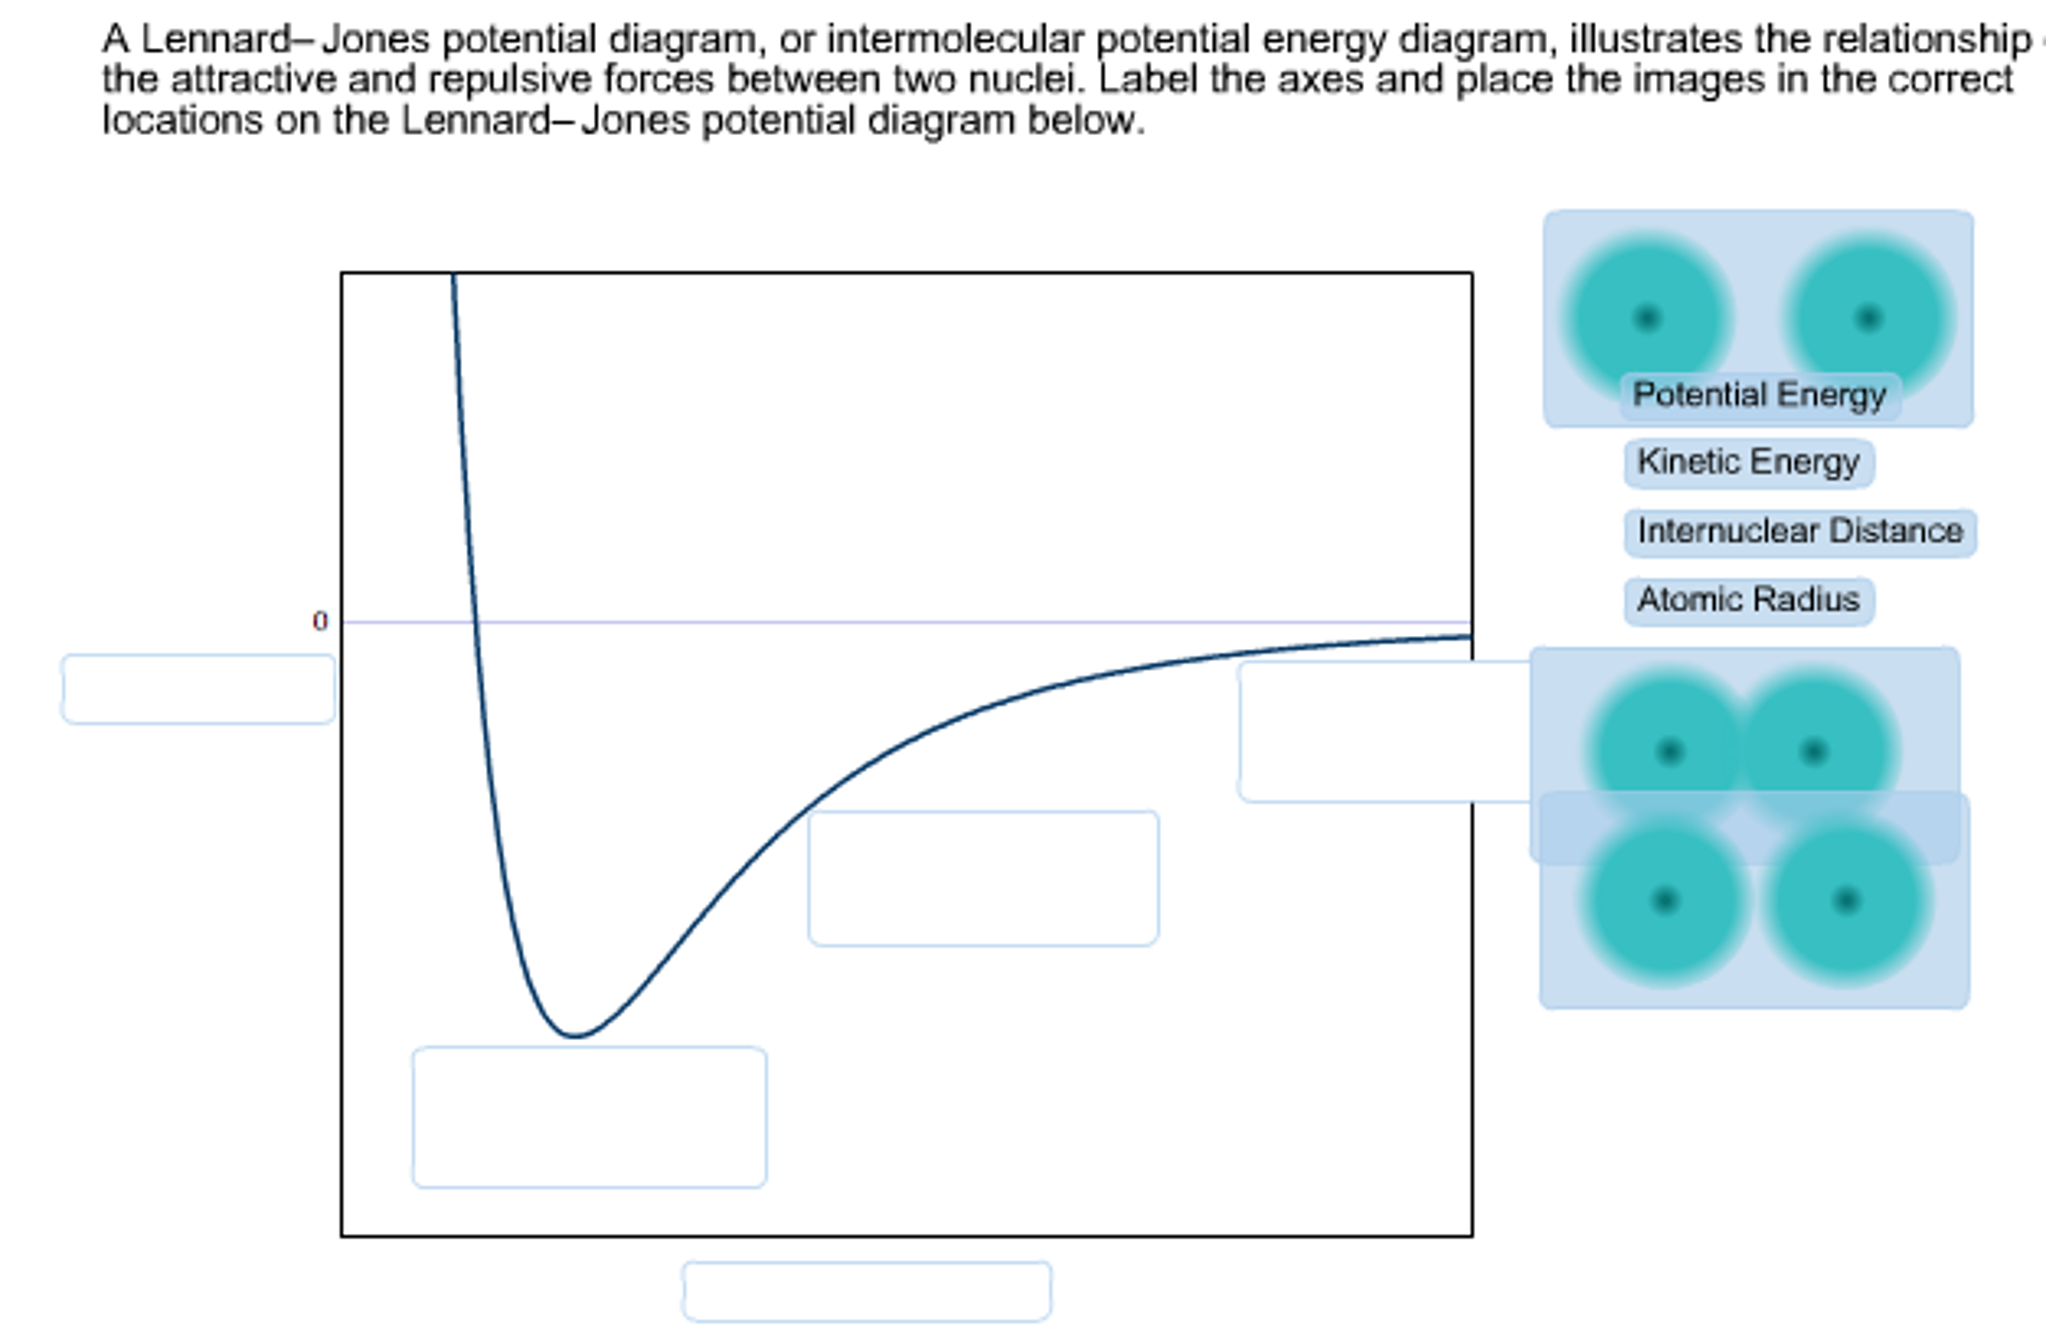 Lennard Jones Potential Diagram